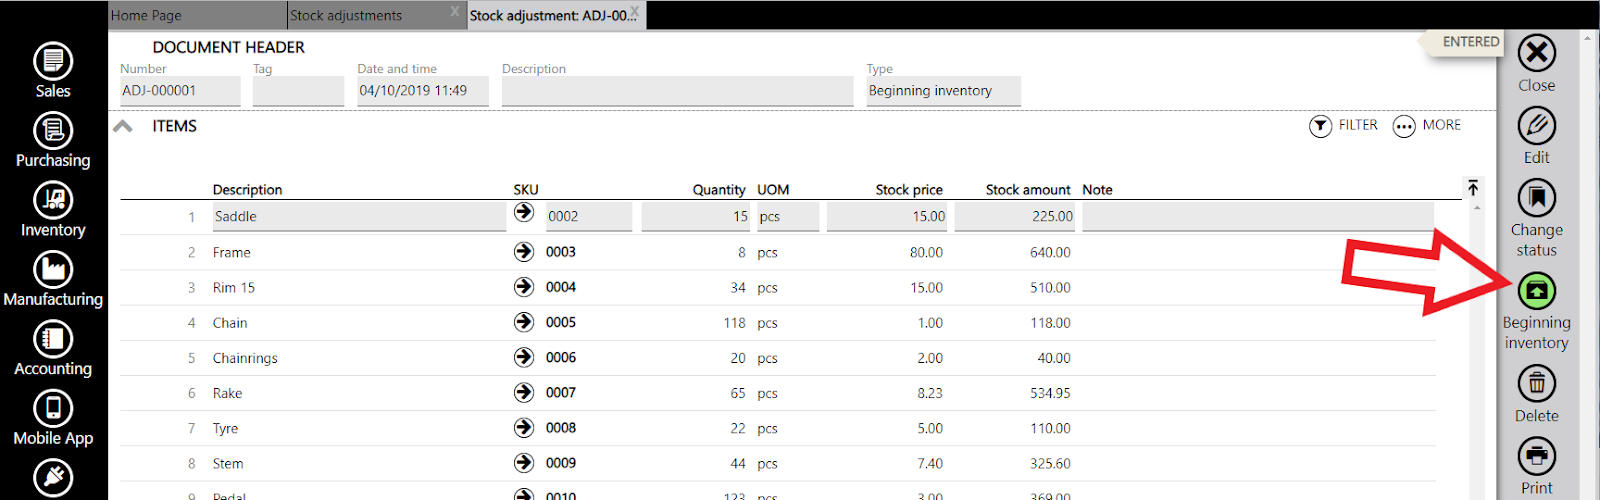 stock adjustment beginning inventory